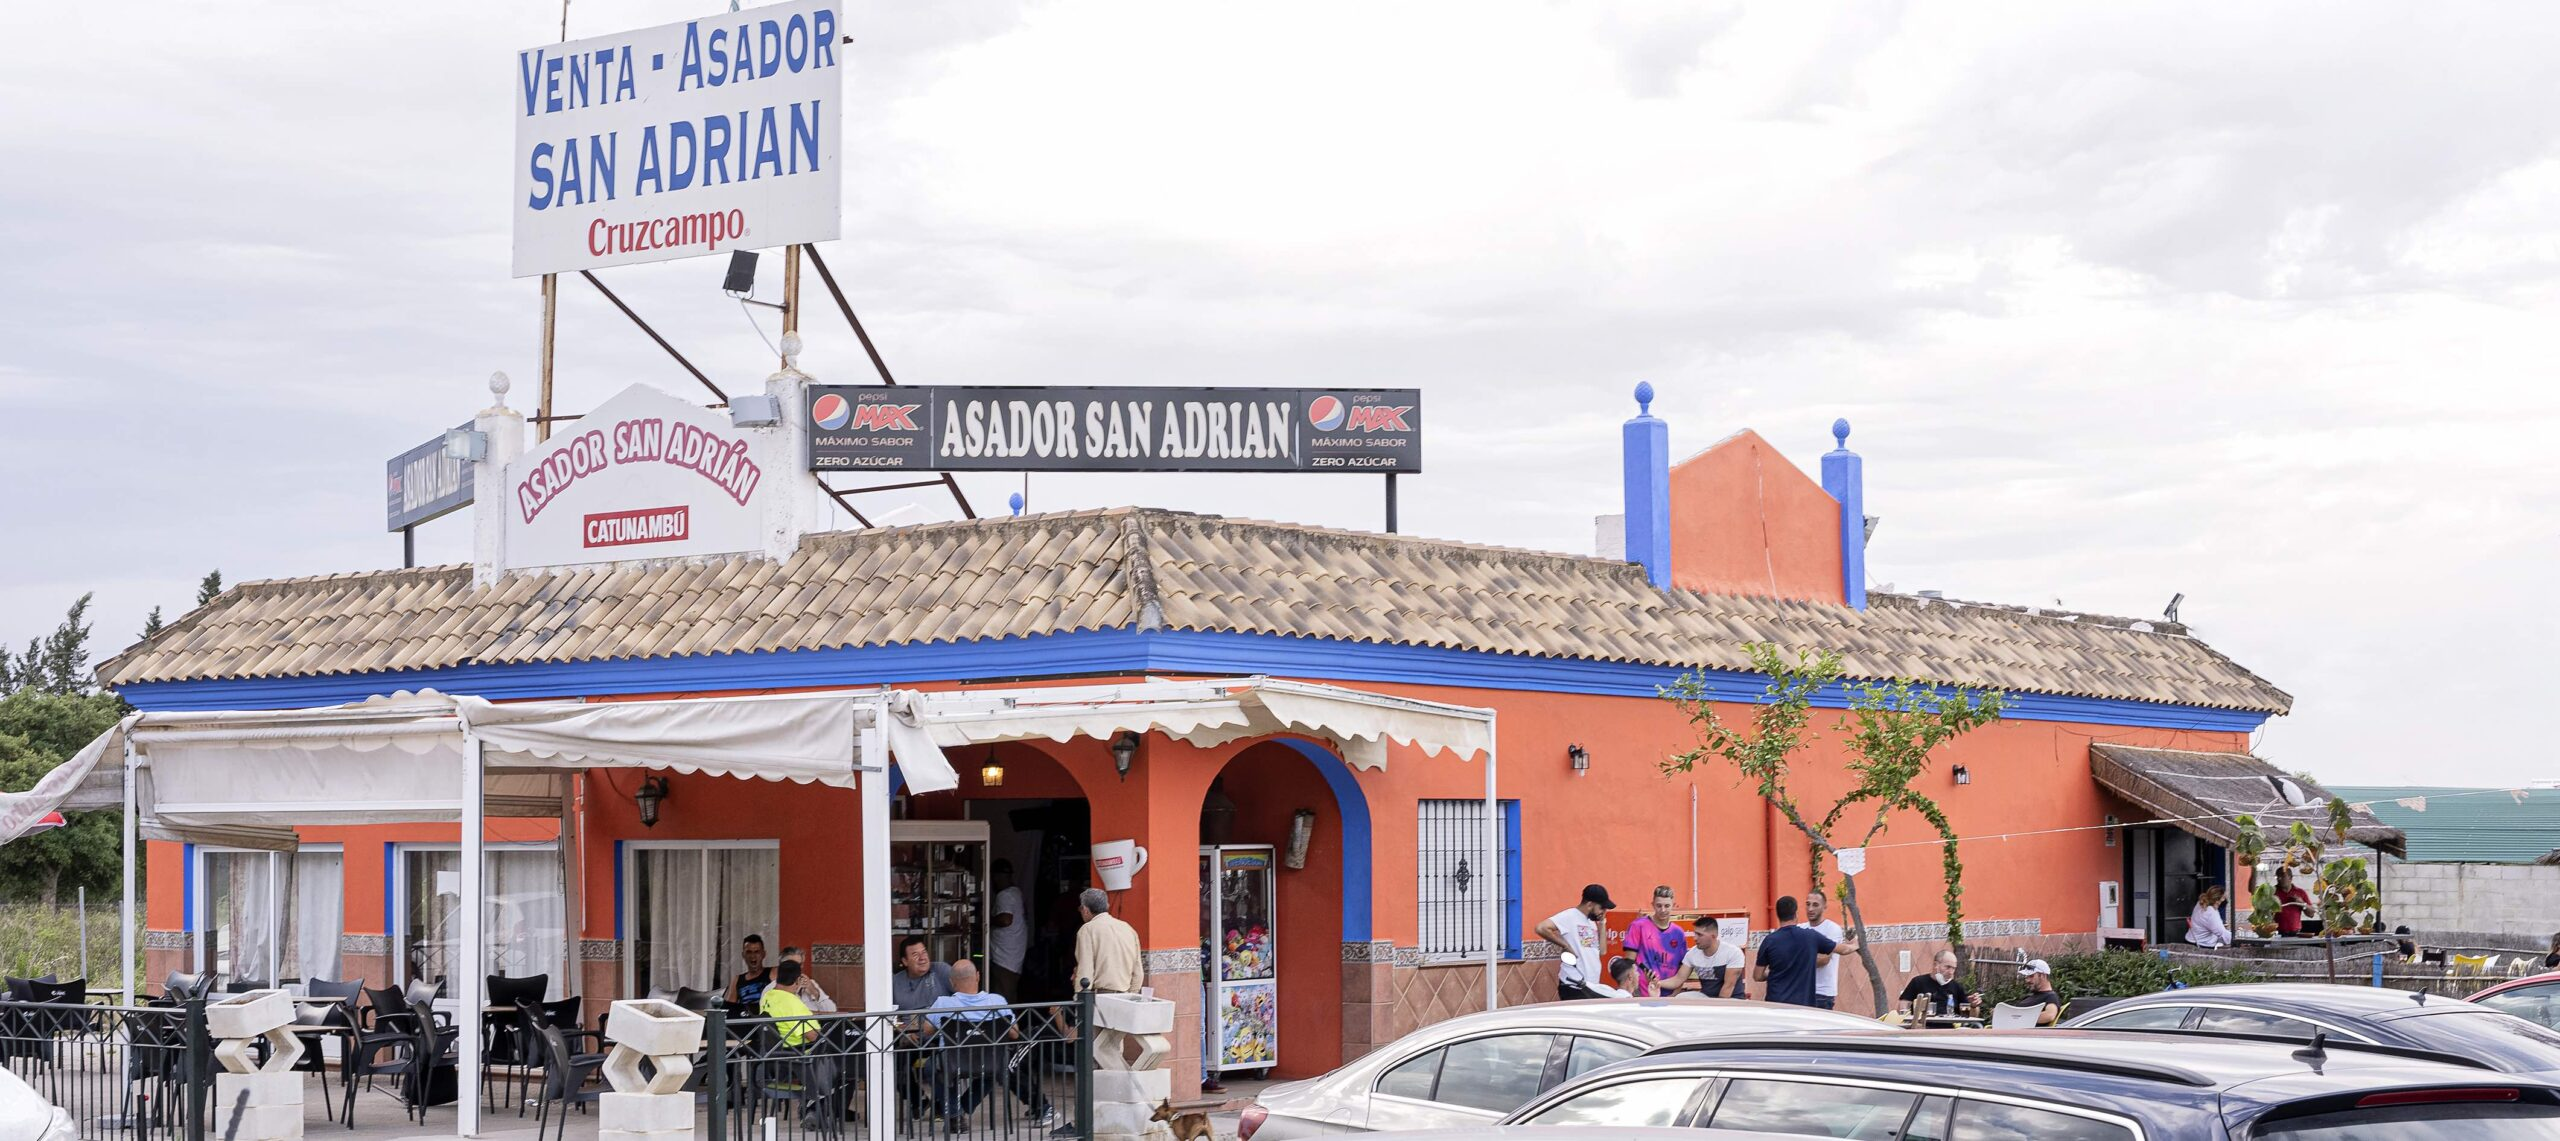 Venta-Asador San Adrián